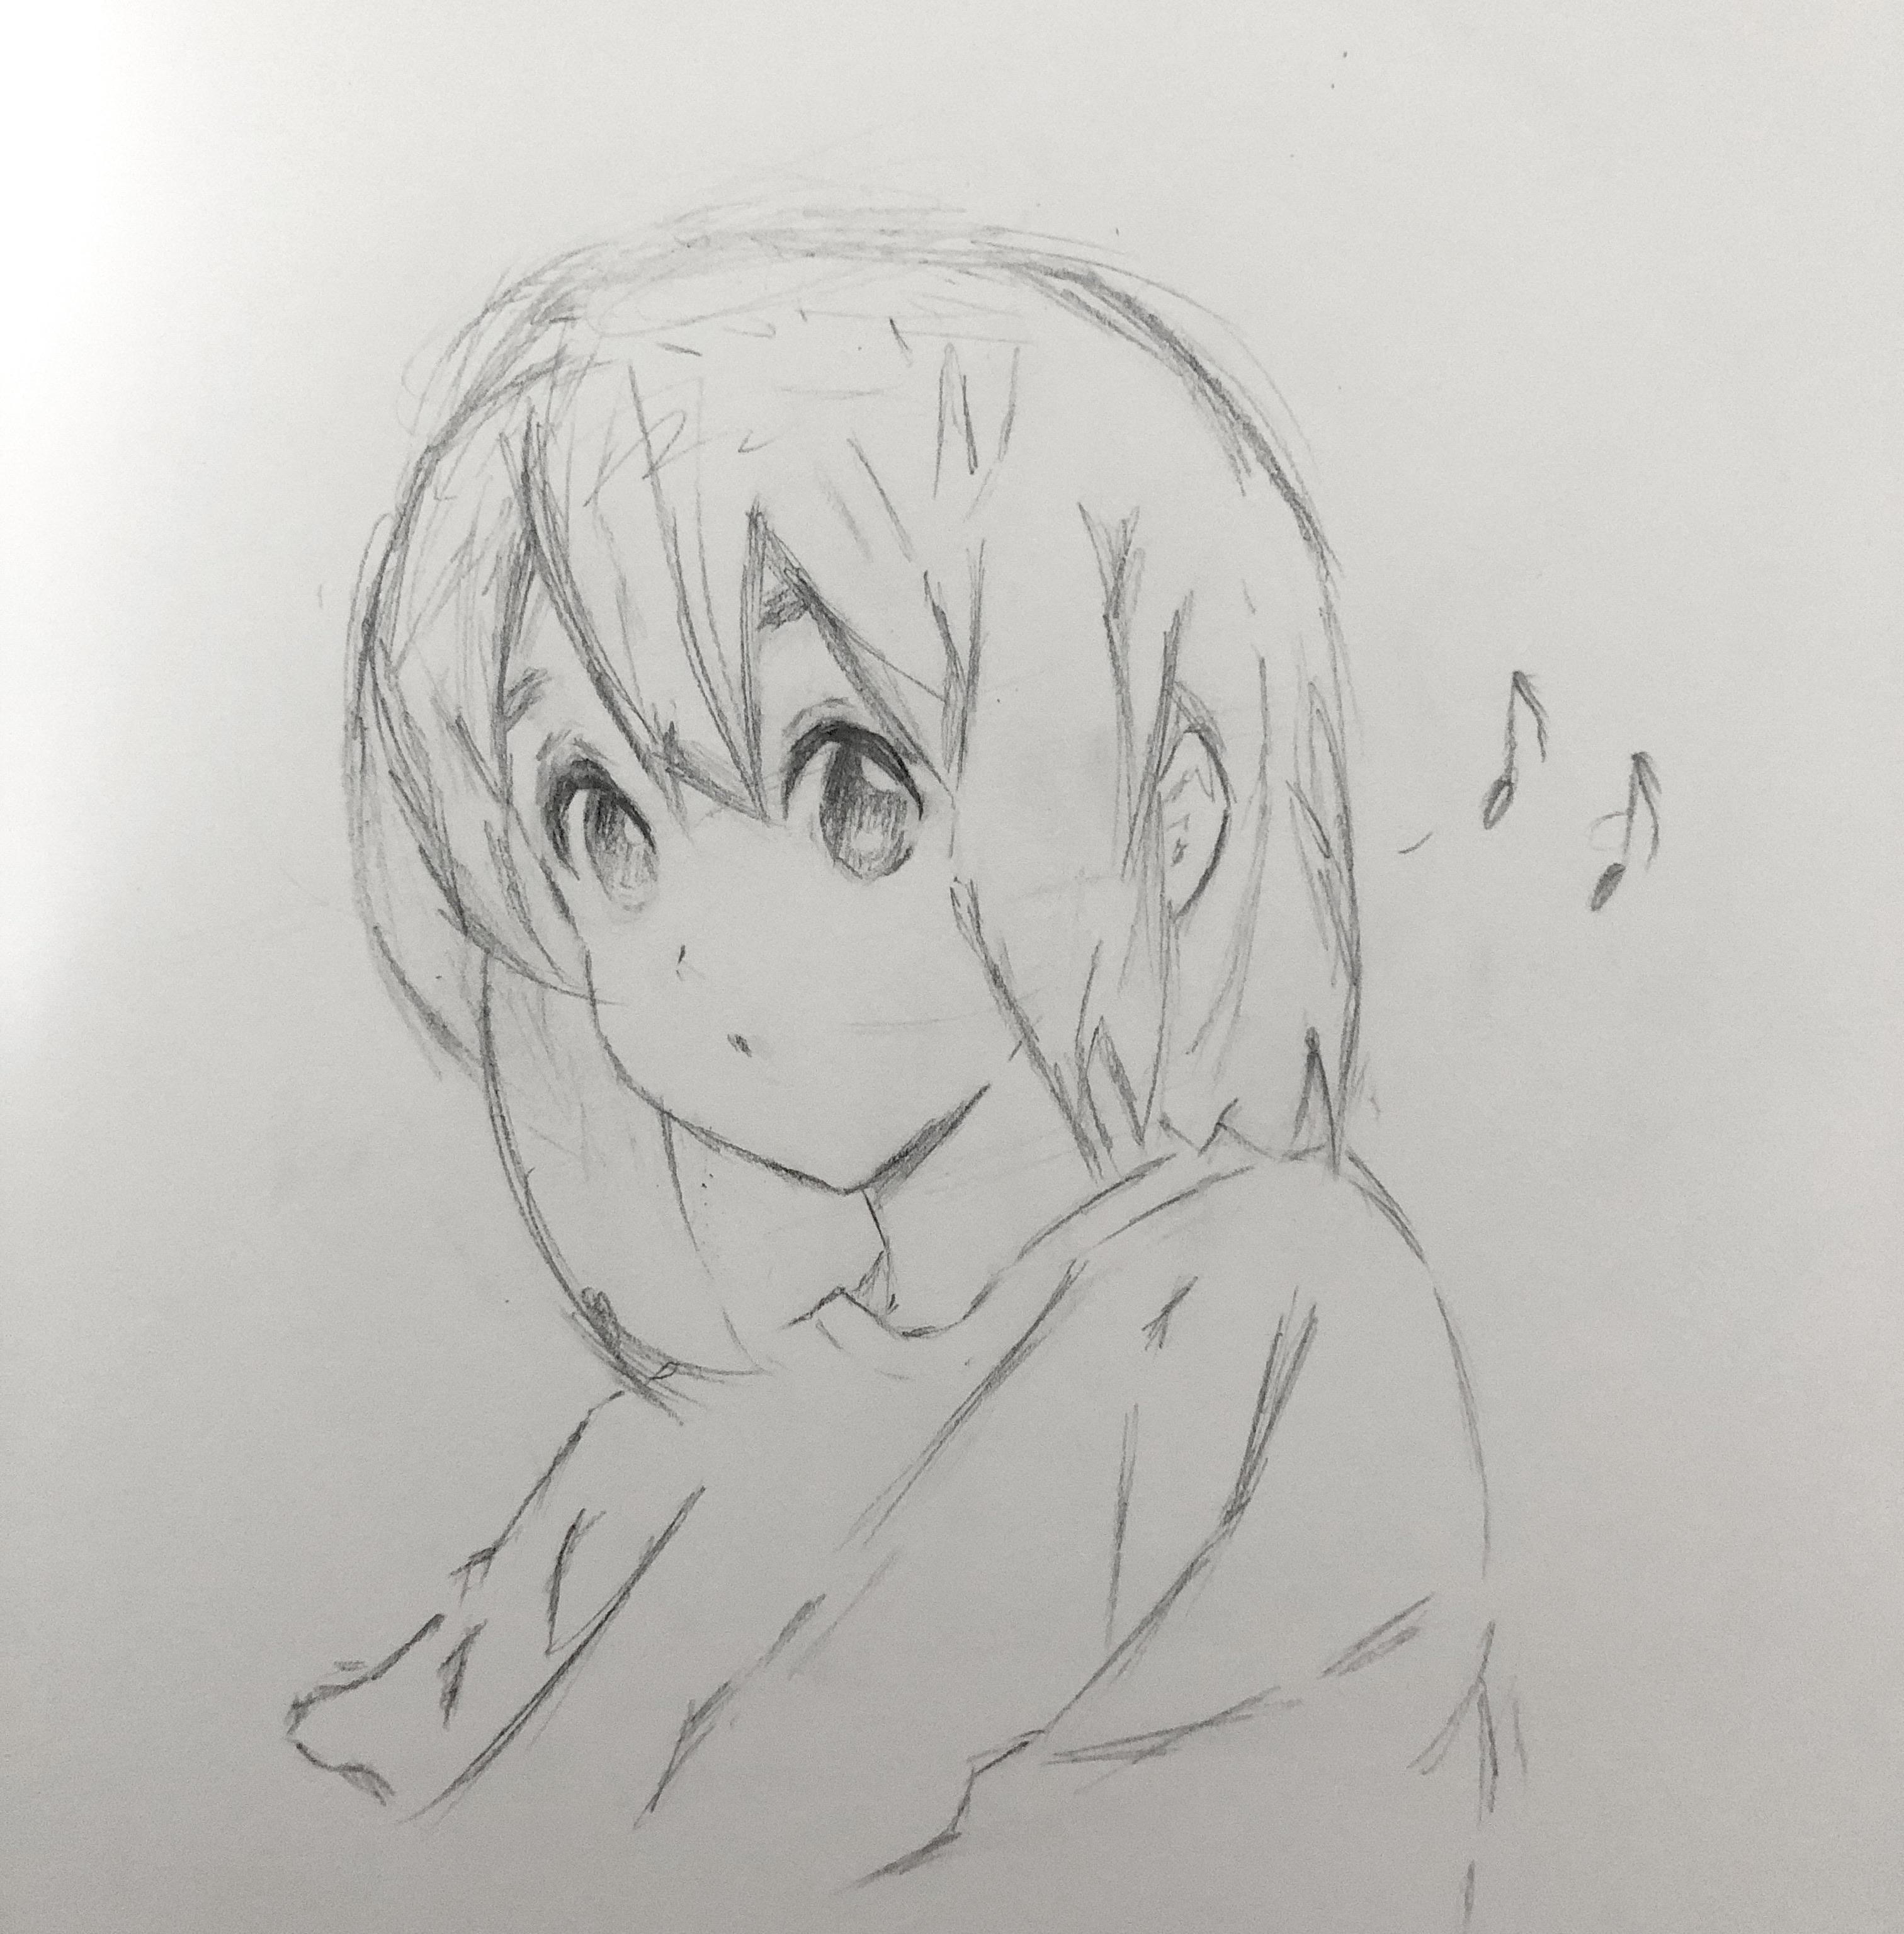 Yui Hirasawa Sketch Anime Animesketch Manga Japan In 2020 Anime Sketch Anime Female Sketch